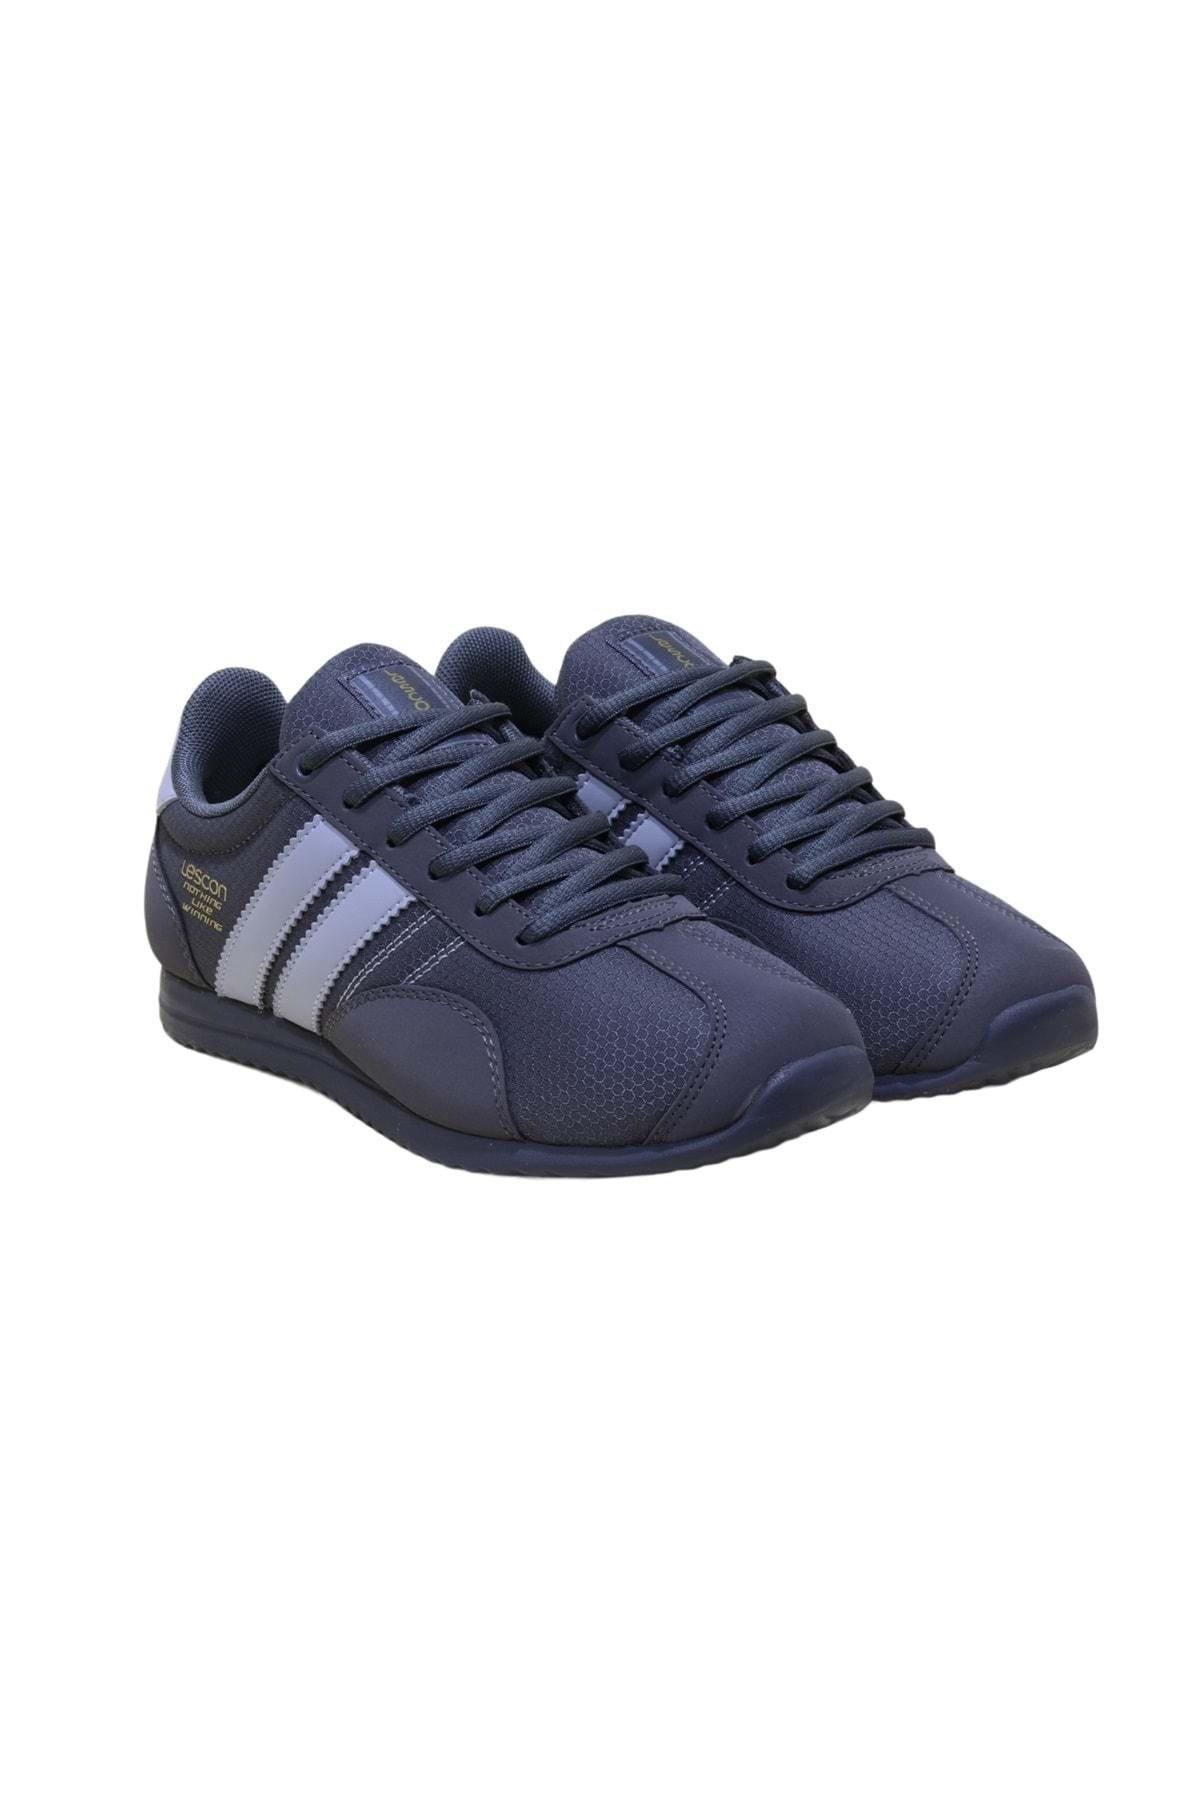 Lescon Gri  Ortopedic Sneakers Ayakkabı 1